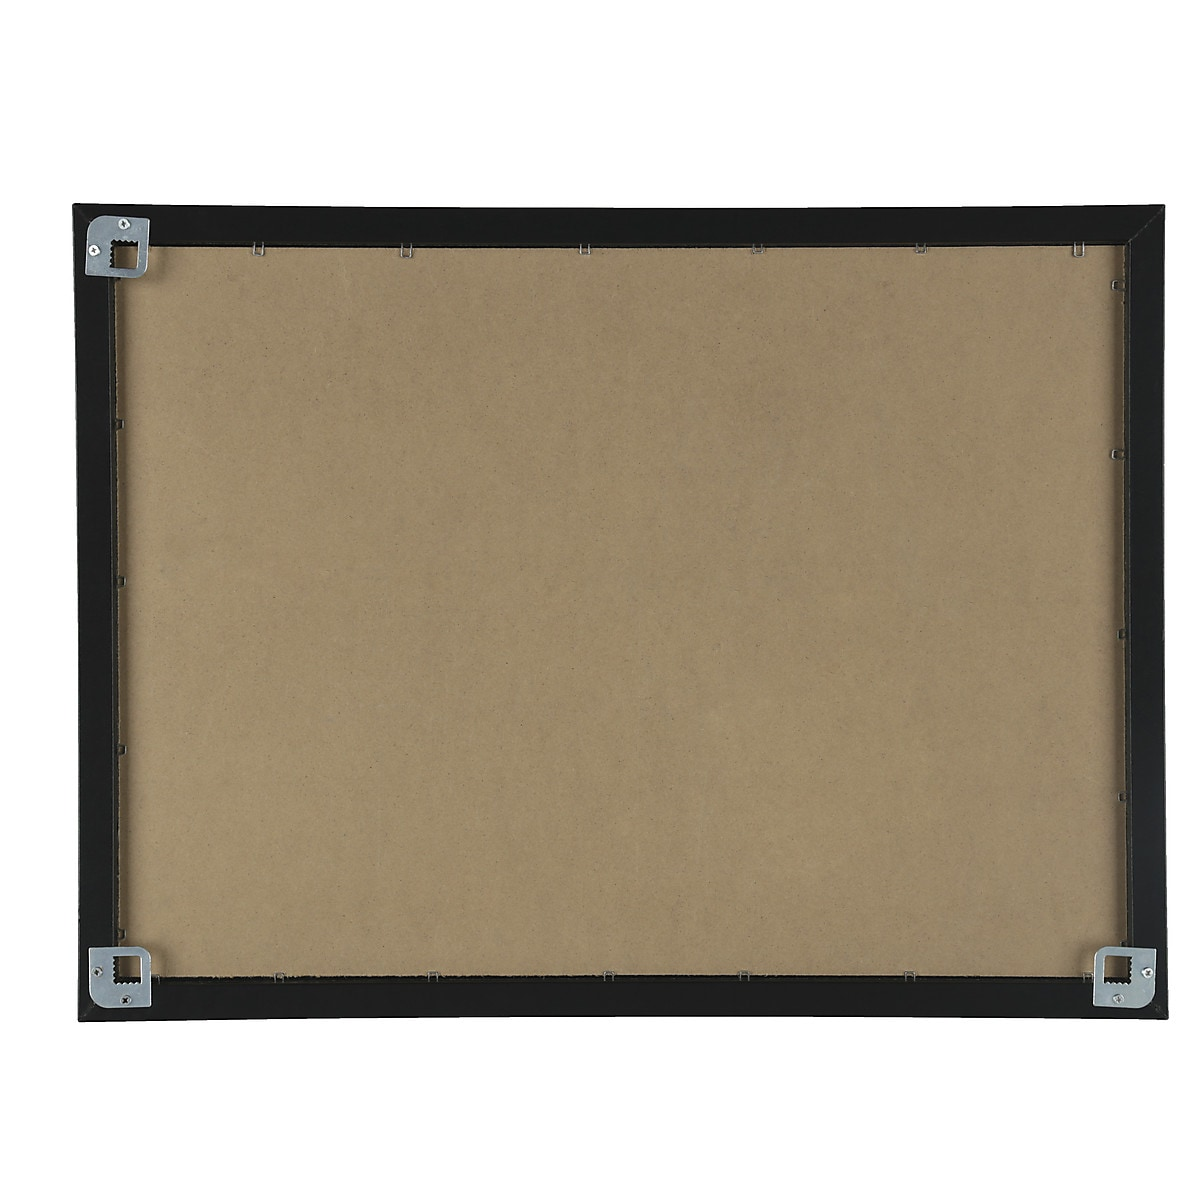 Liitutaulu 58,5x43,3 cm